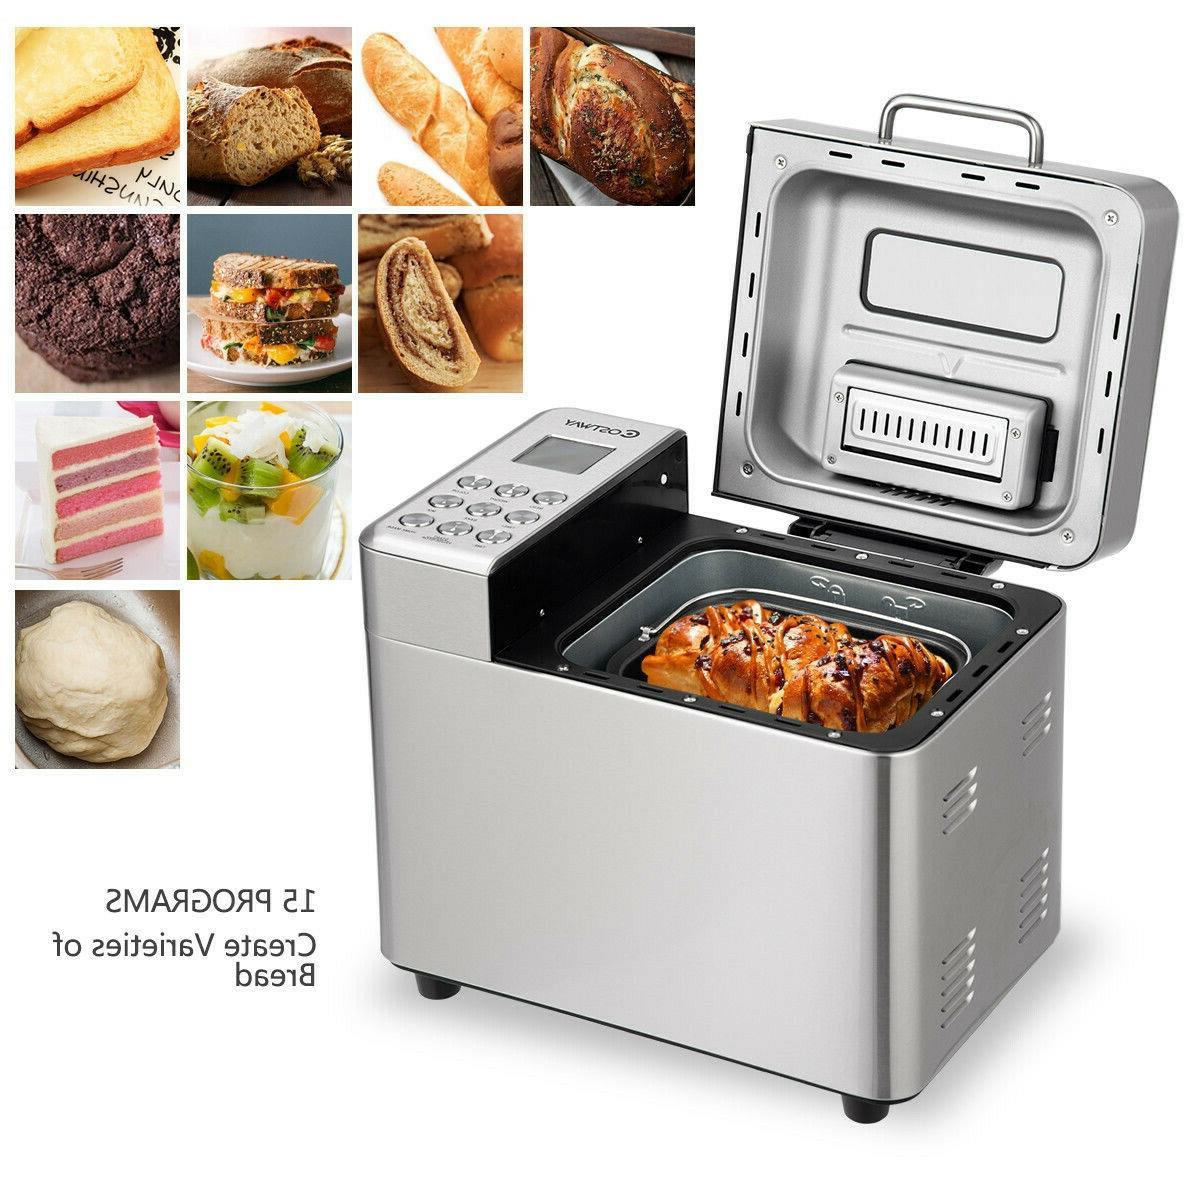 2 librasMaquina programadora de pan automatica inoxidable